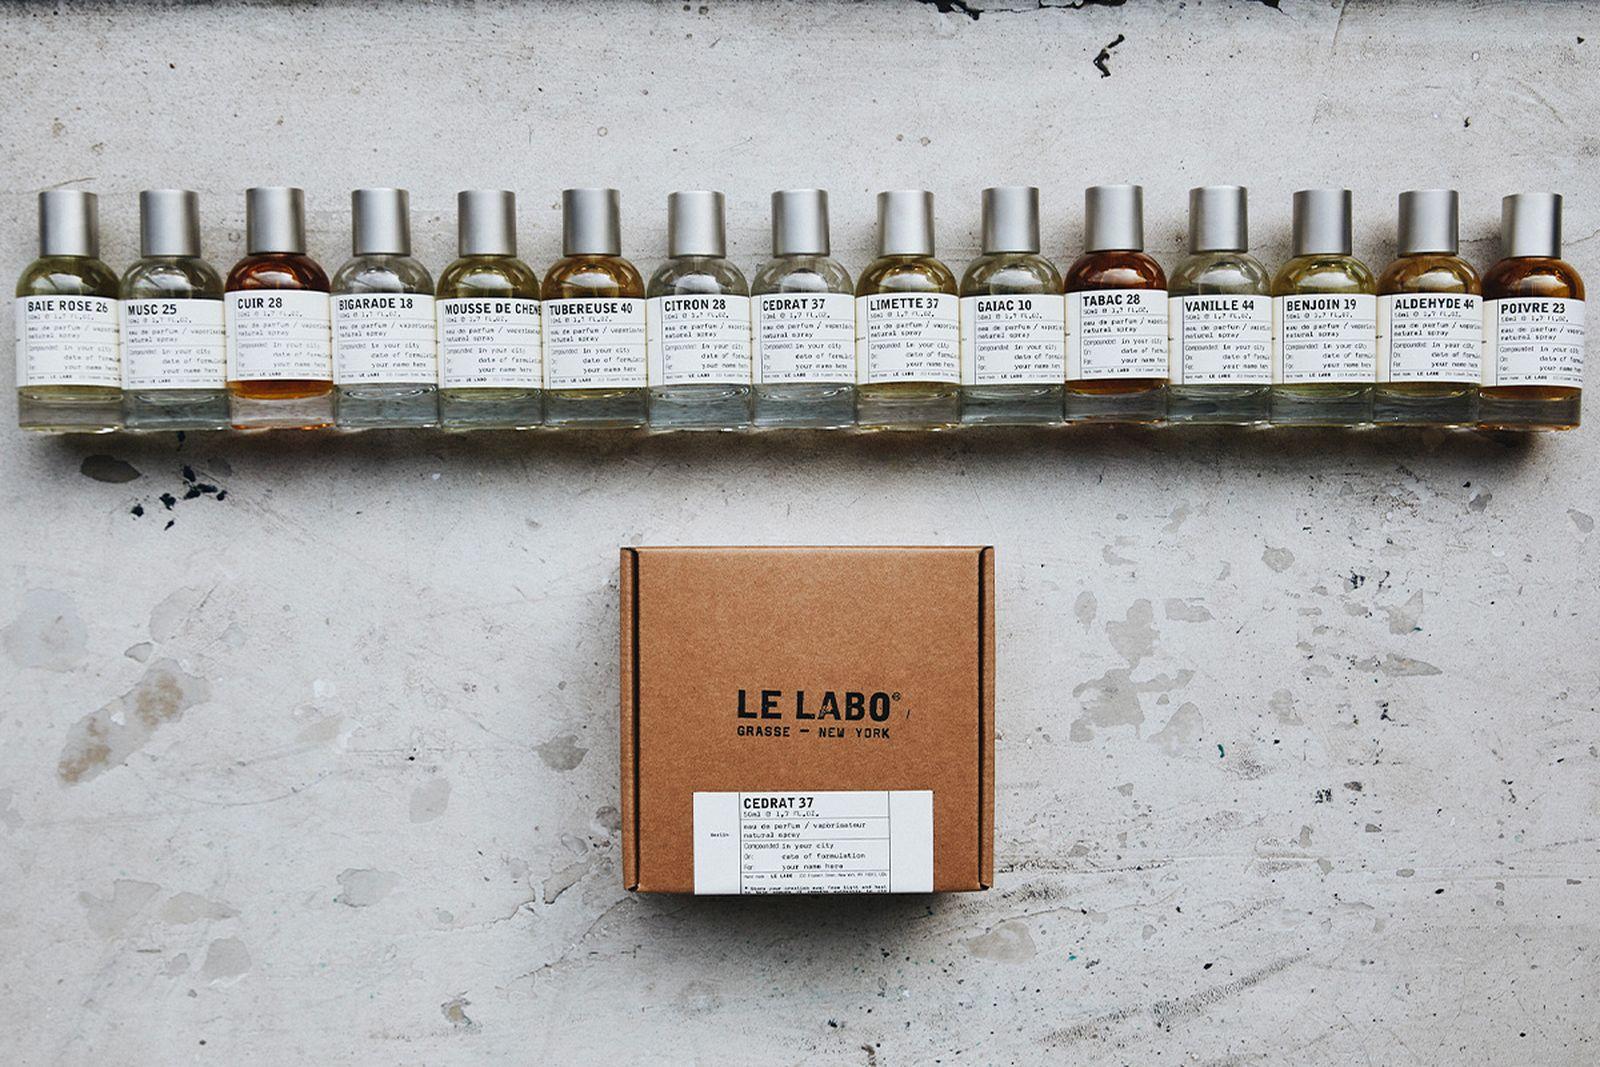 le-labo-berlin-city-exclusive-fragrance-05